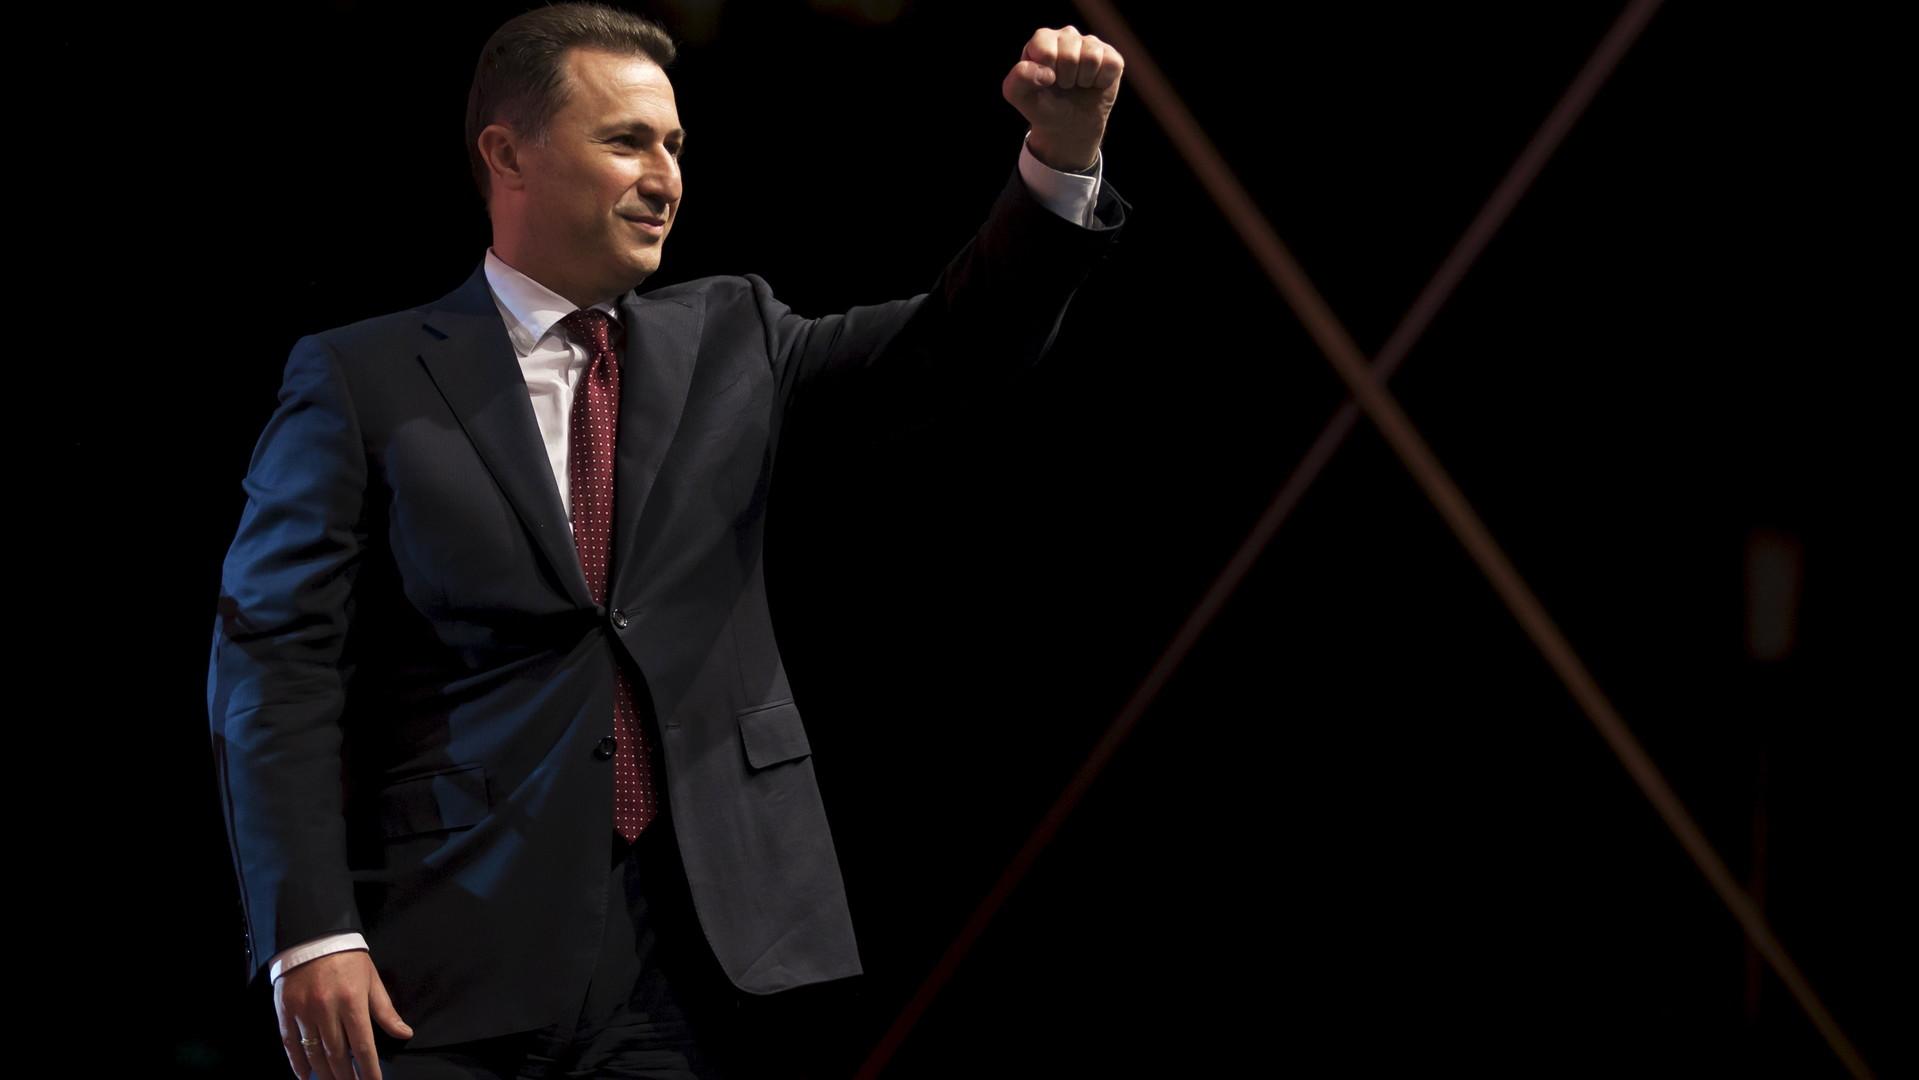 Le Premier ministre macédonien Nicola Gruevski